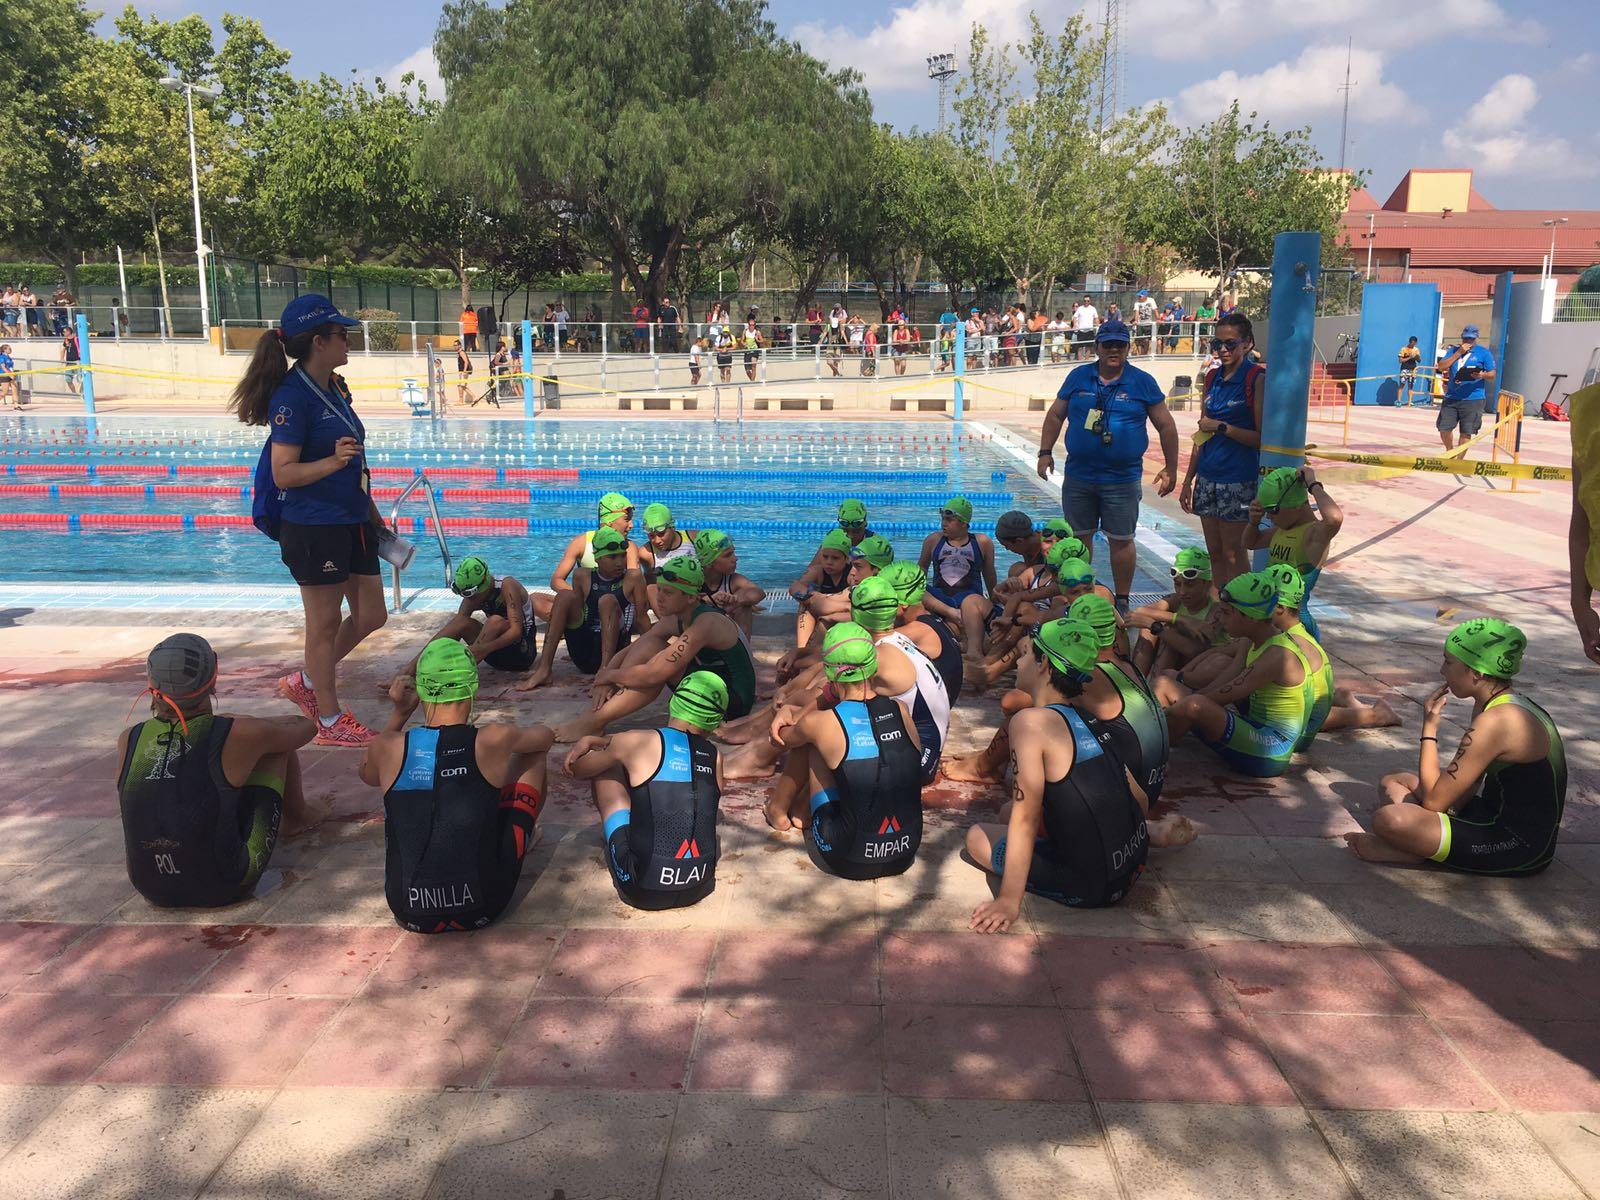 M s de un centenar de escolares compitieron en el triatl n for Piscina municipal manises